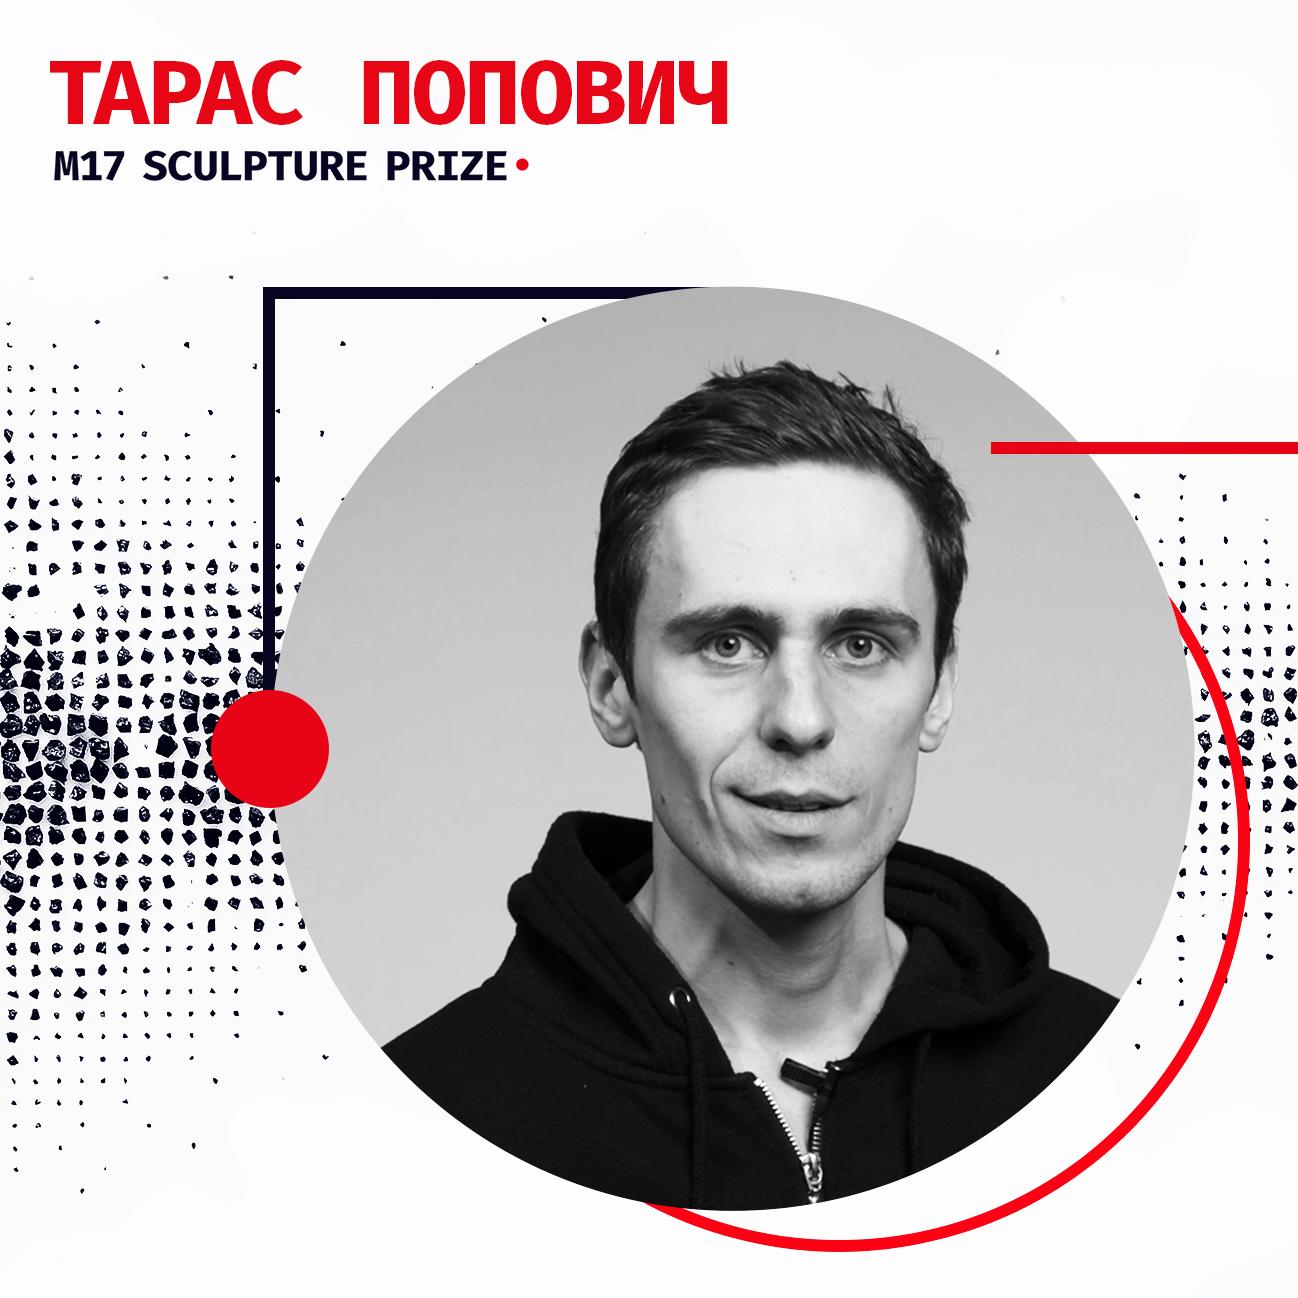 Nominees for the M17 Sculpture Prize: Taras Popovych (Lviv)